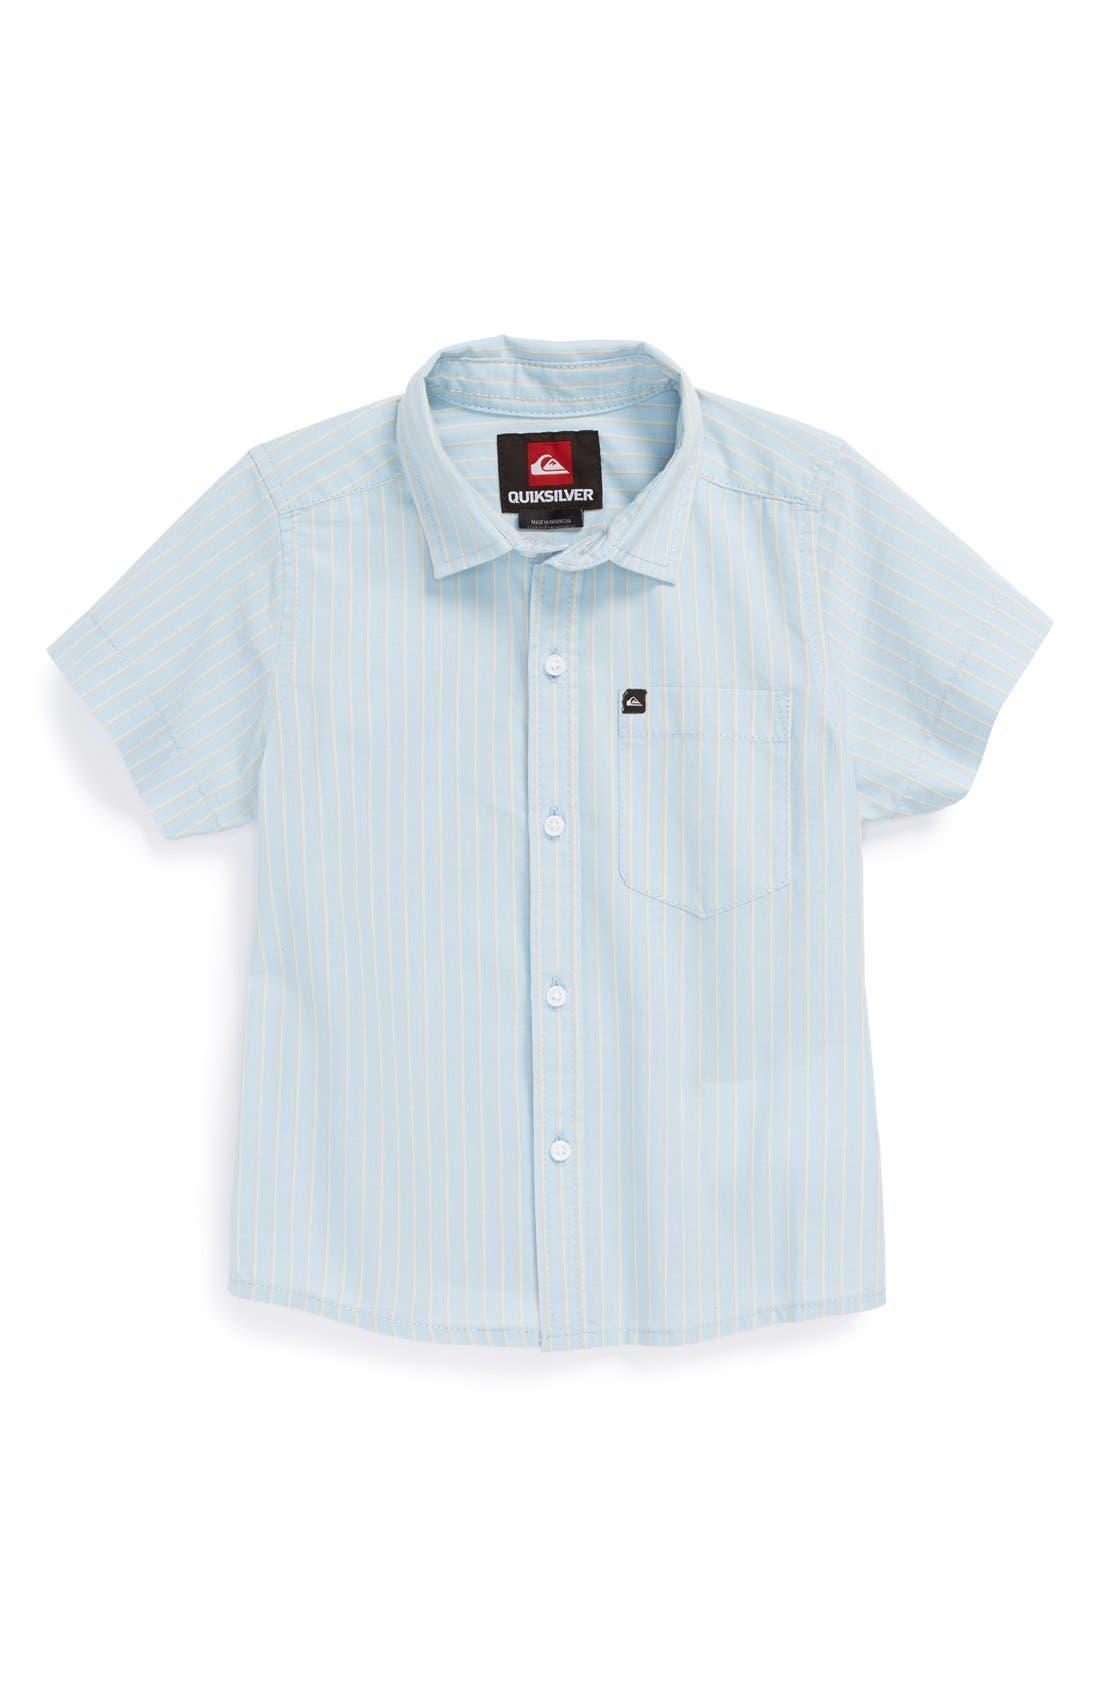 Alternate Image 1 Selected - Quiksilver 'Barracuda Cay' Short Sleeve Woven Shirt (Little Boys & Big Boys)